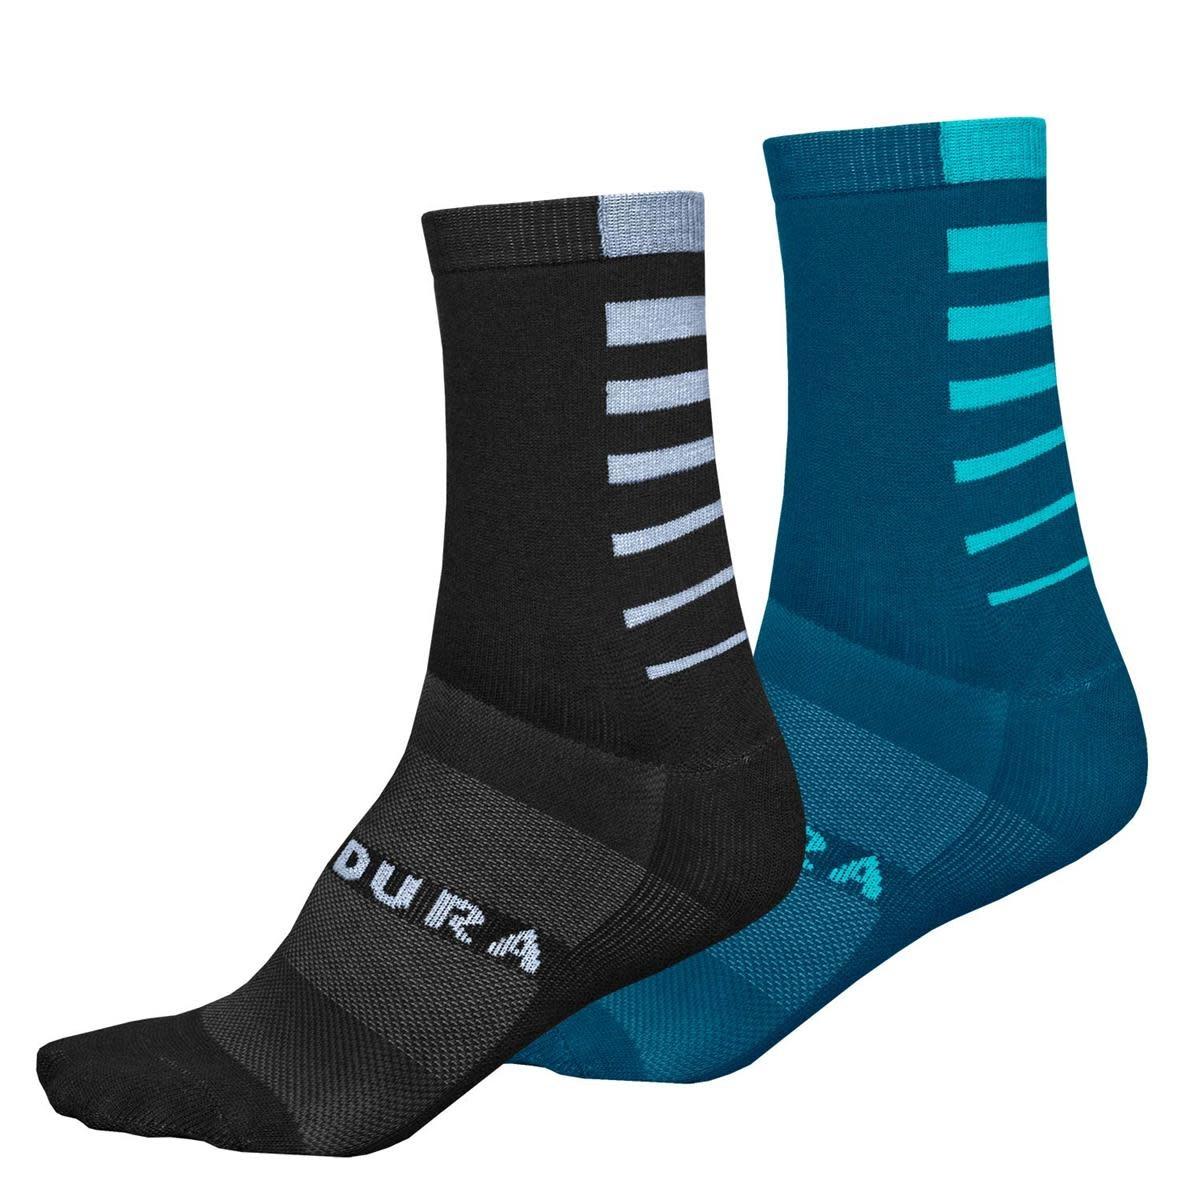 Bas Endura Coolmax Stripe - 2 paires : Turquoise & Noir